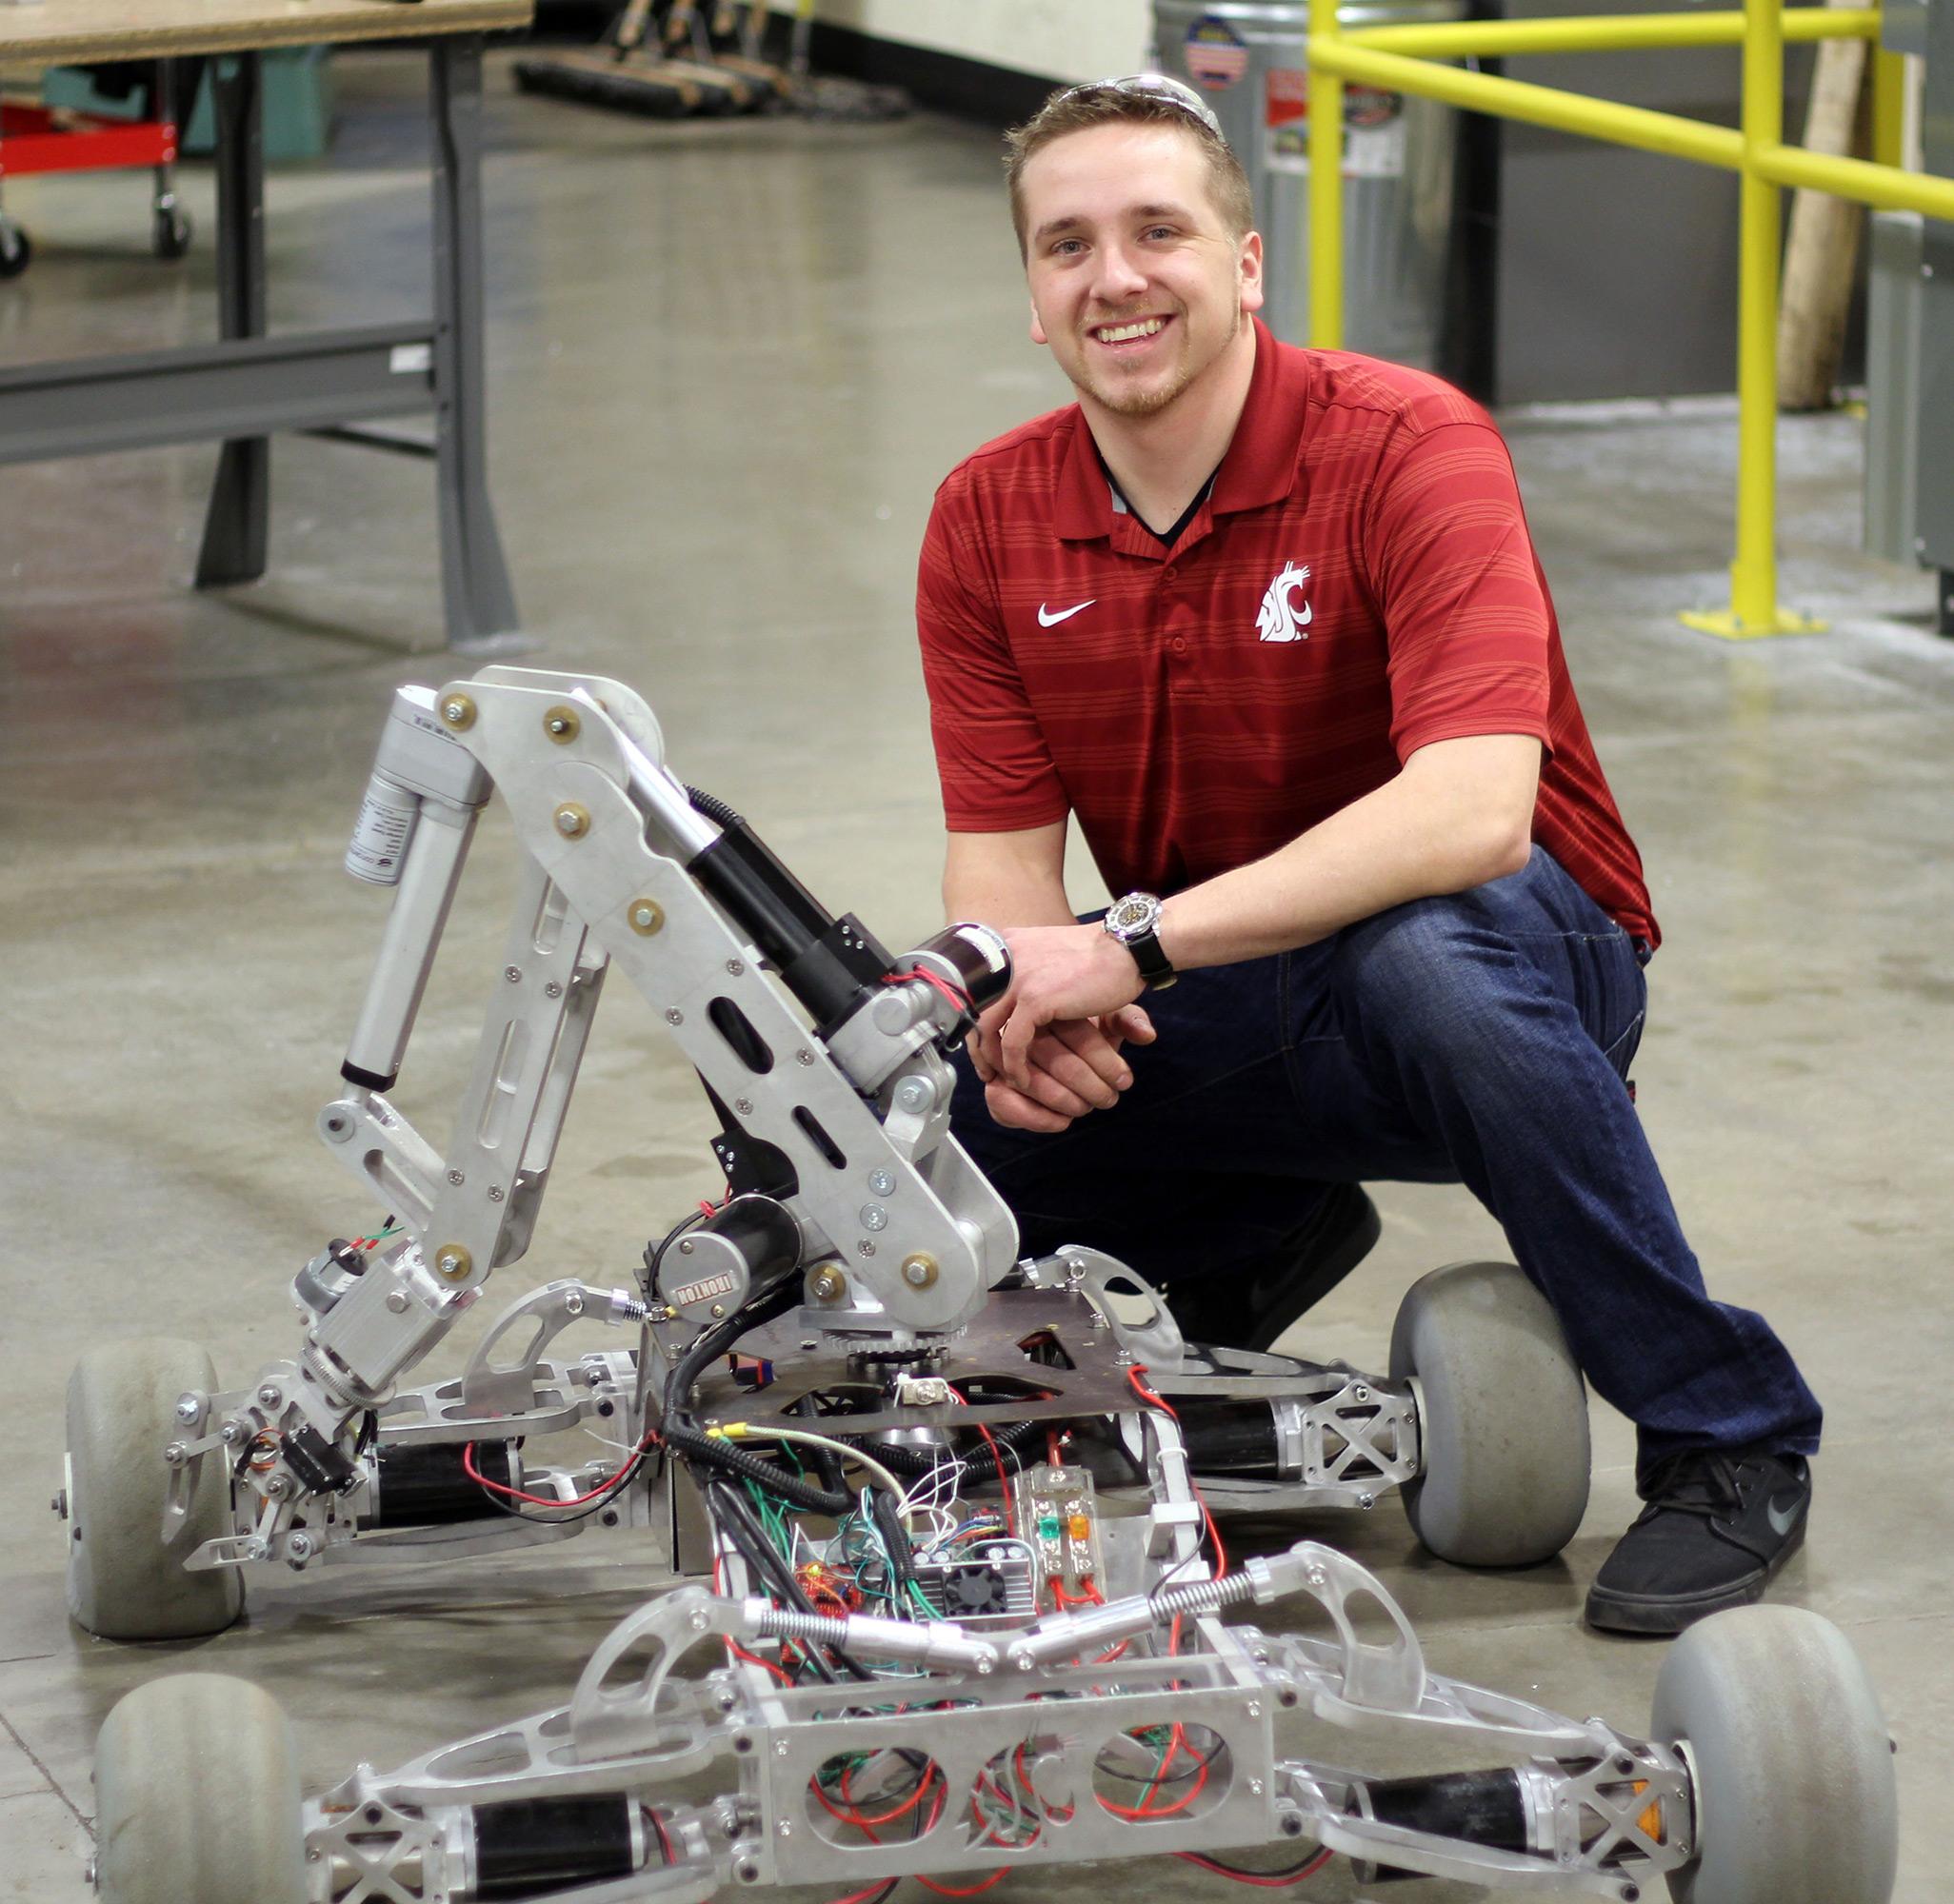 mars rover challenge team building - photo #22